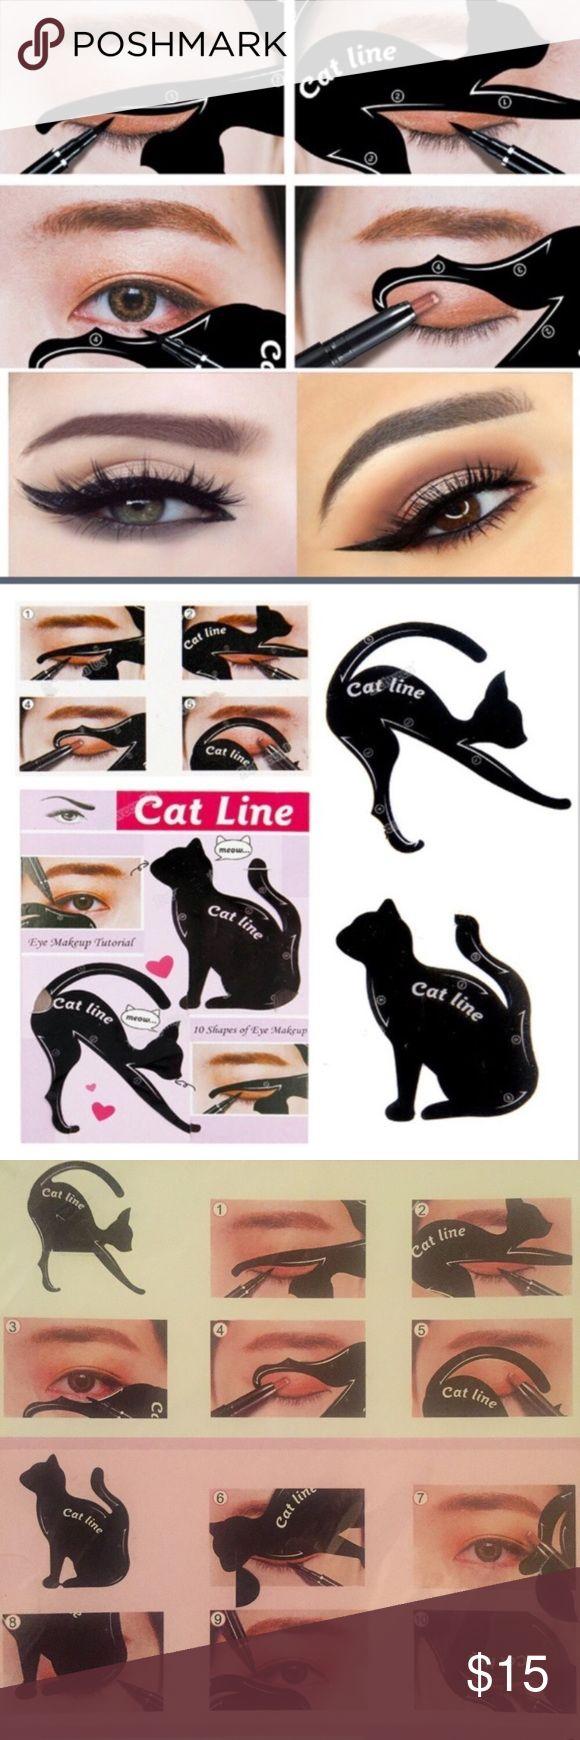 😺2 packs😺 Cat eye makeup stencils! Makeup Brushes & Tools